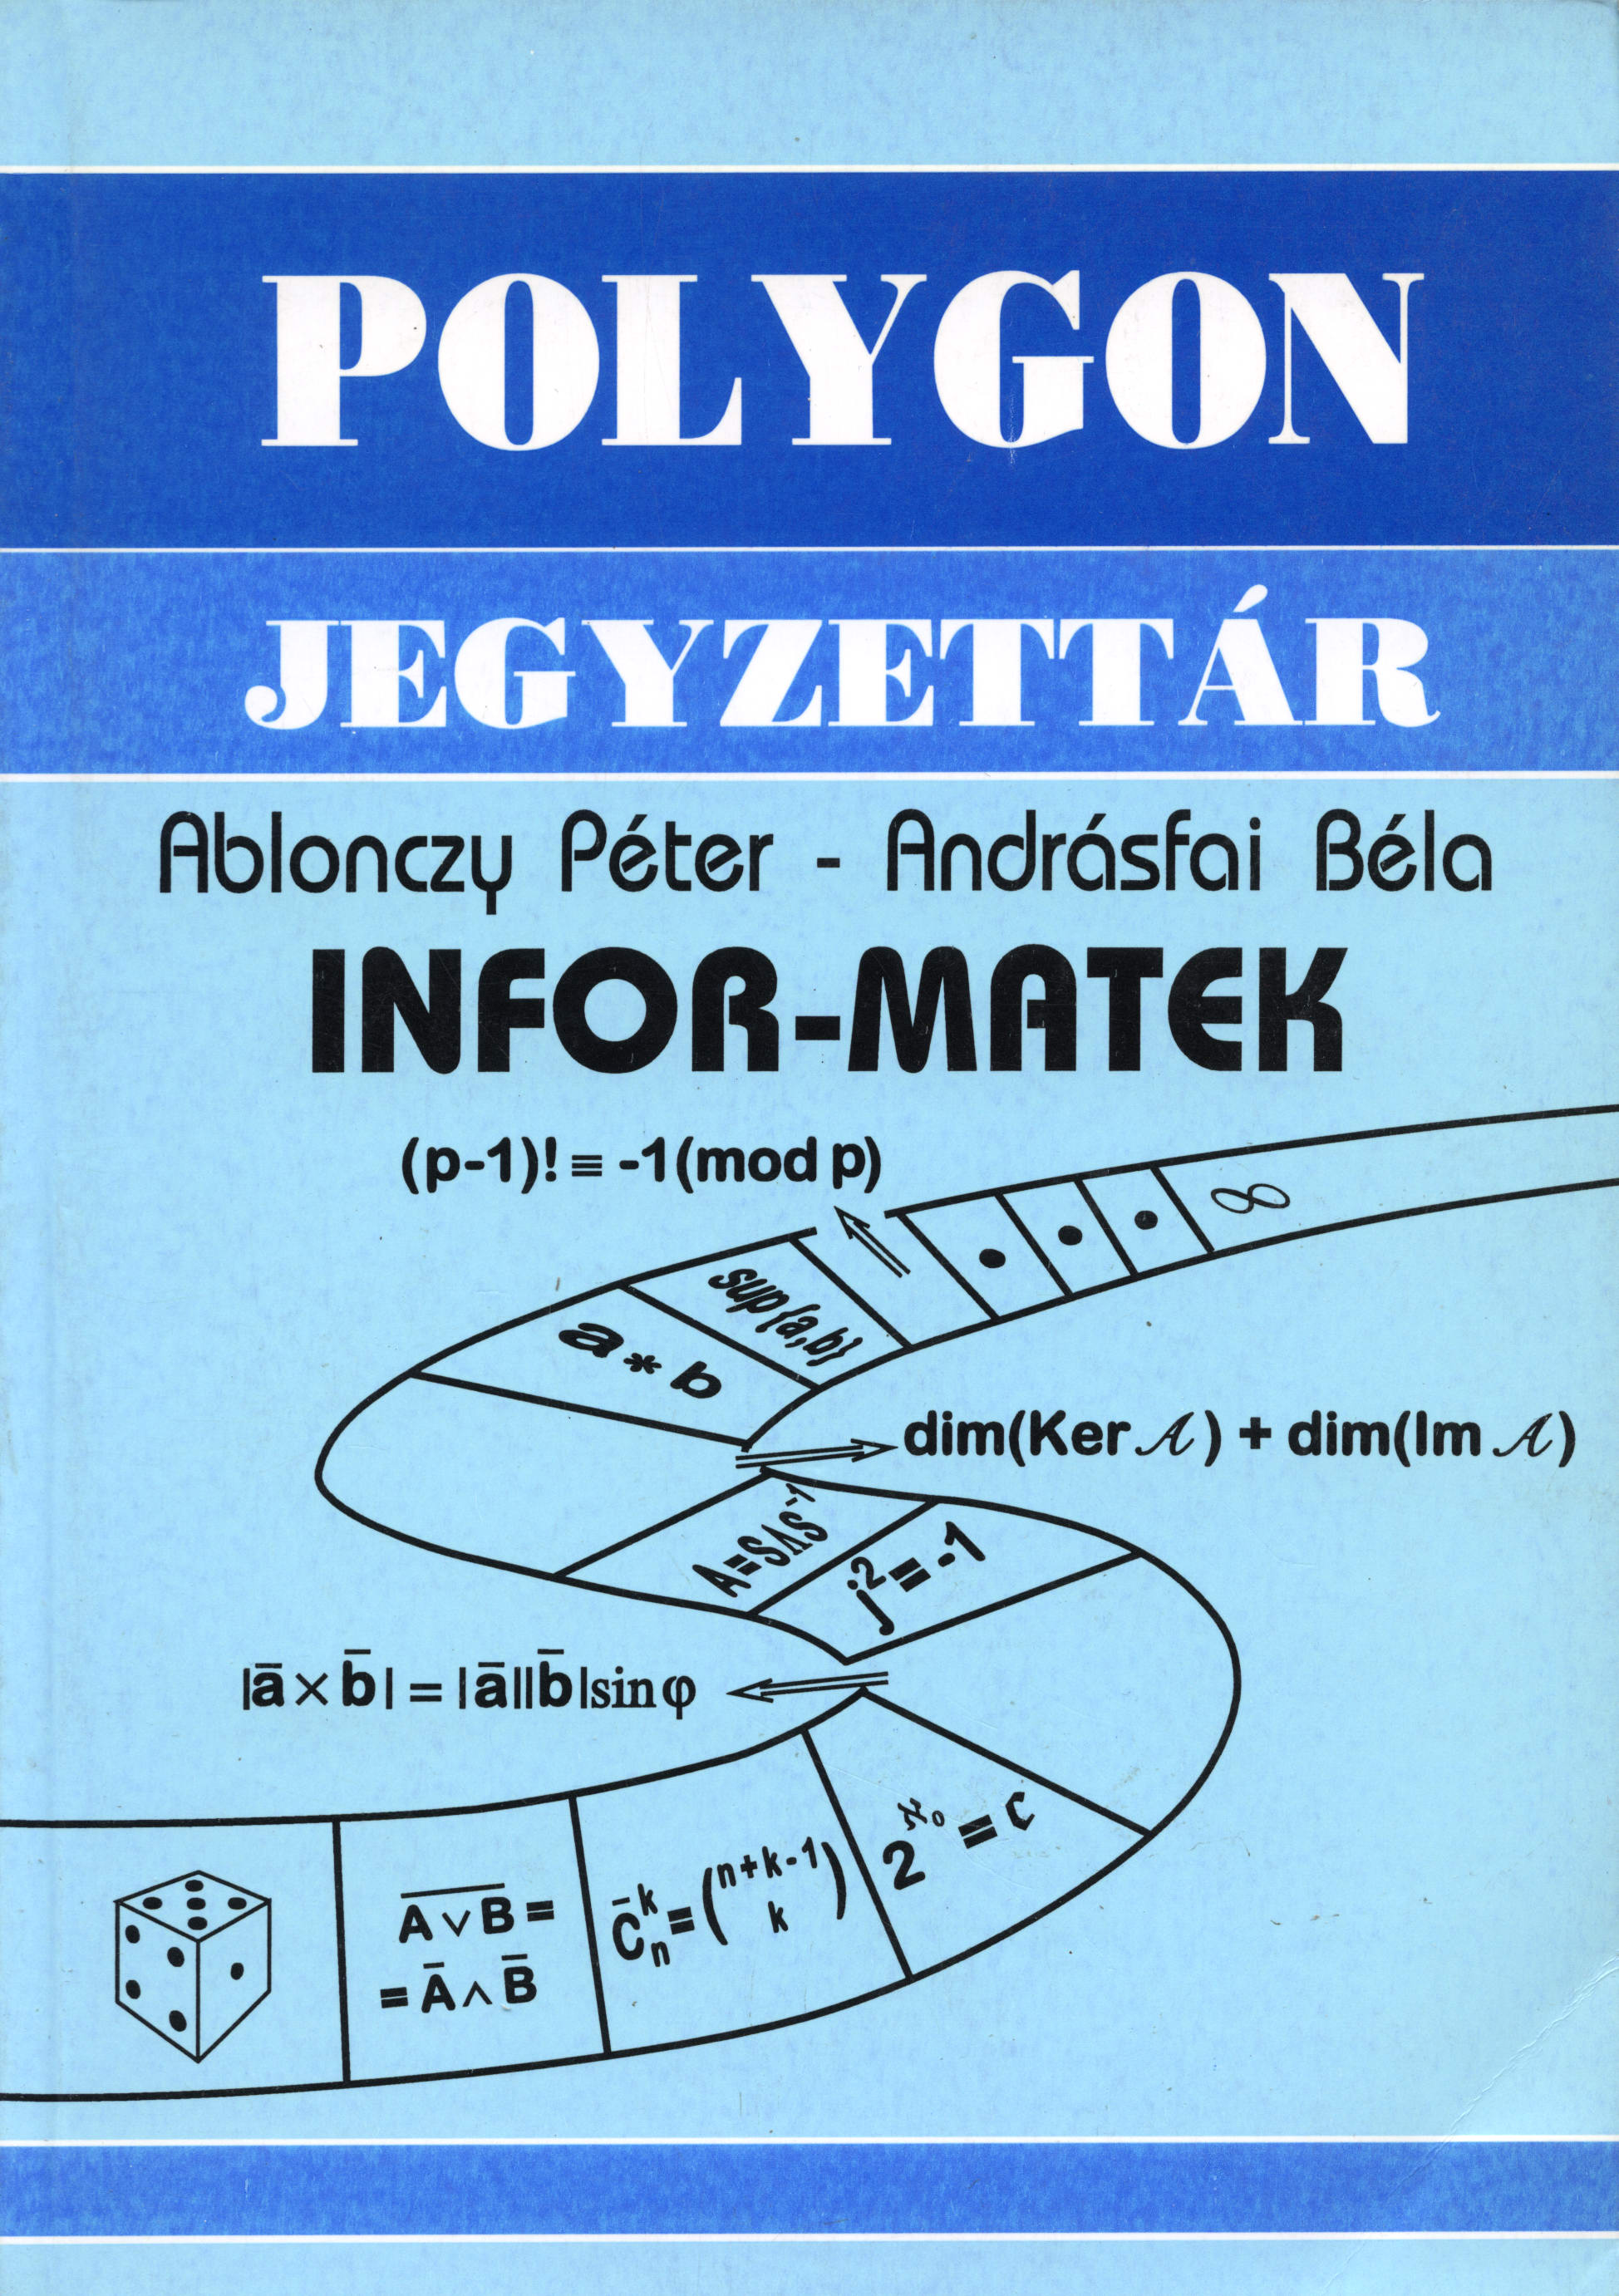 Infor-Matek - Polygon jegyzet